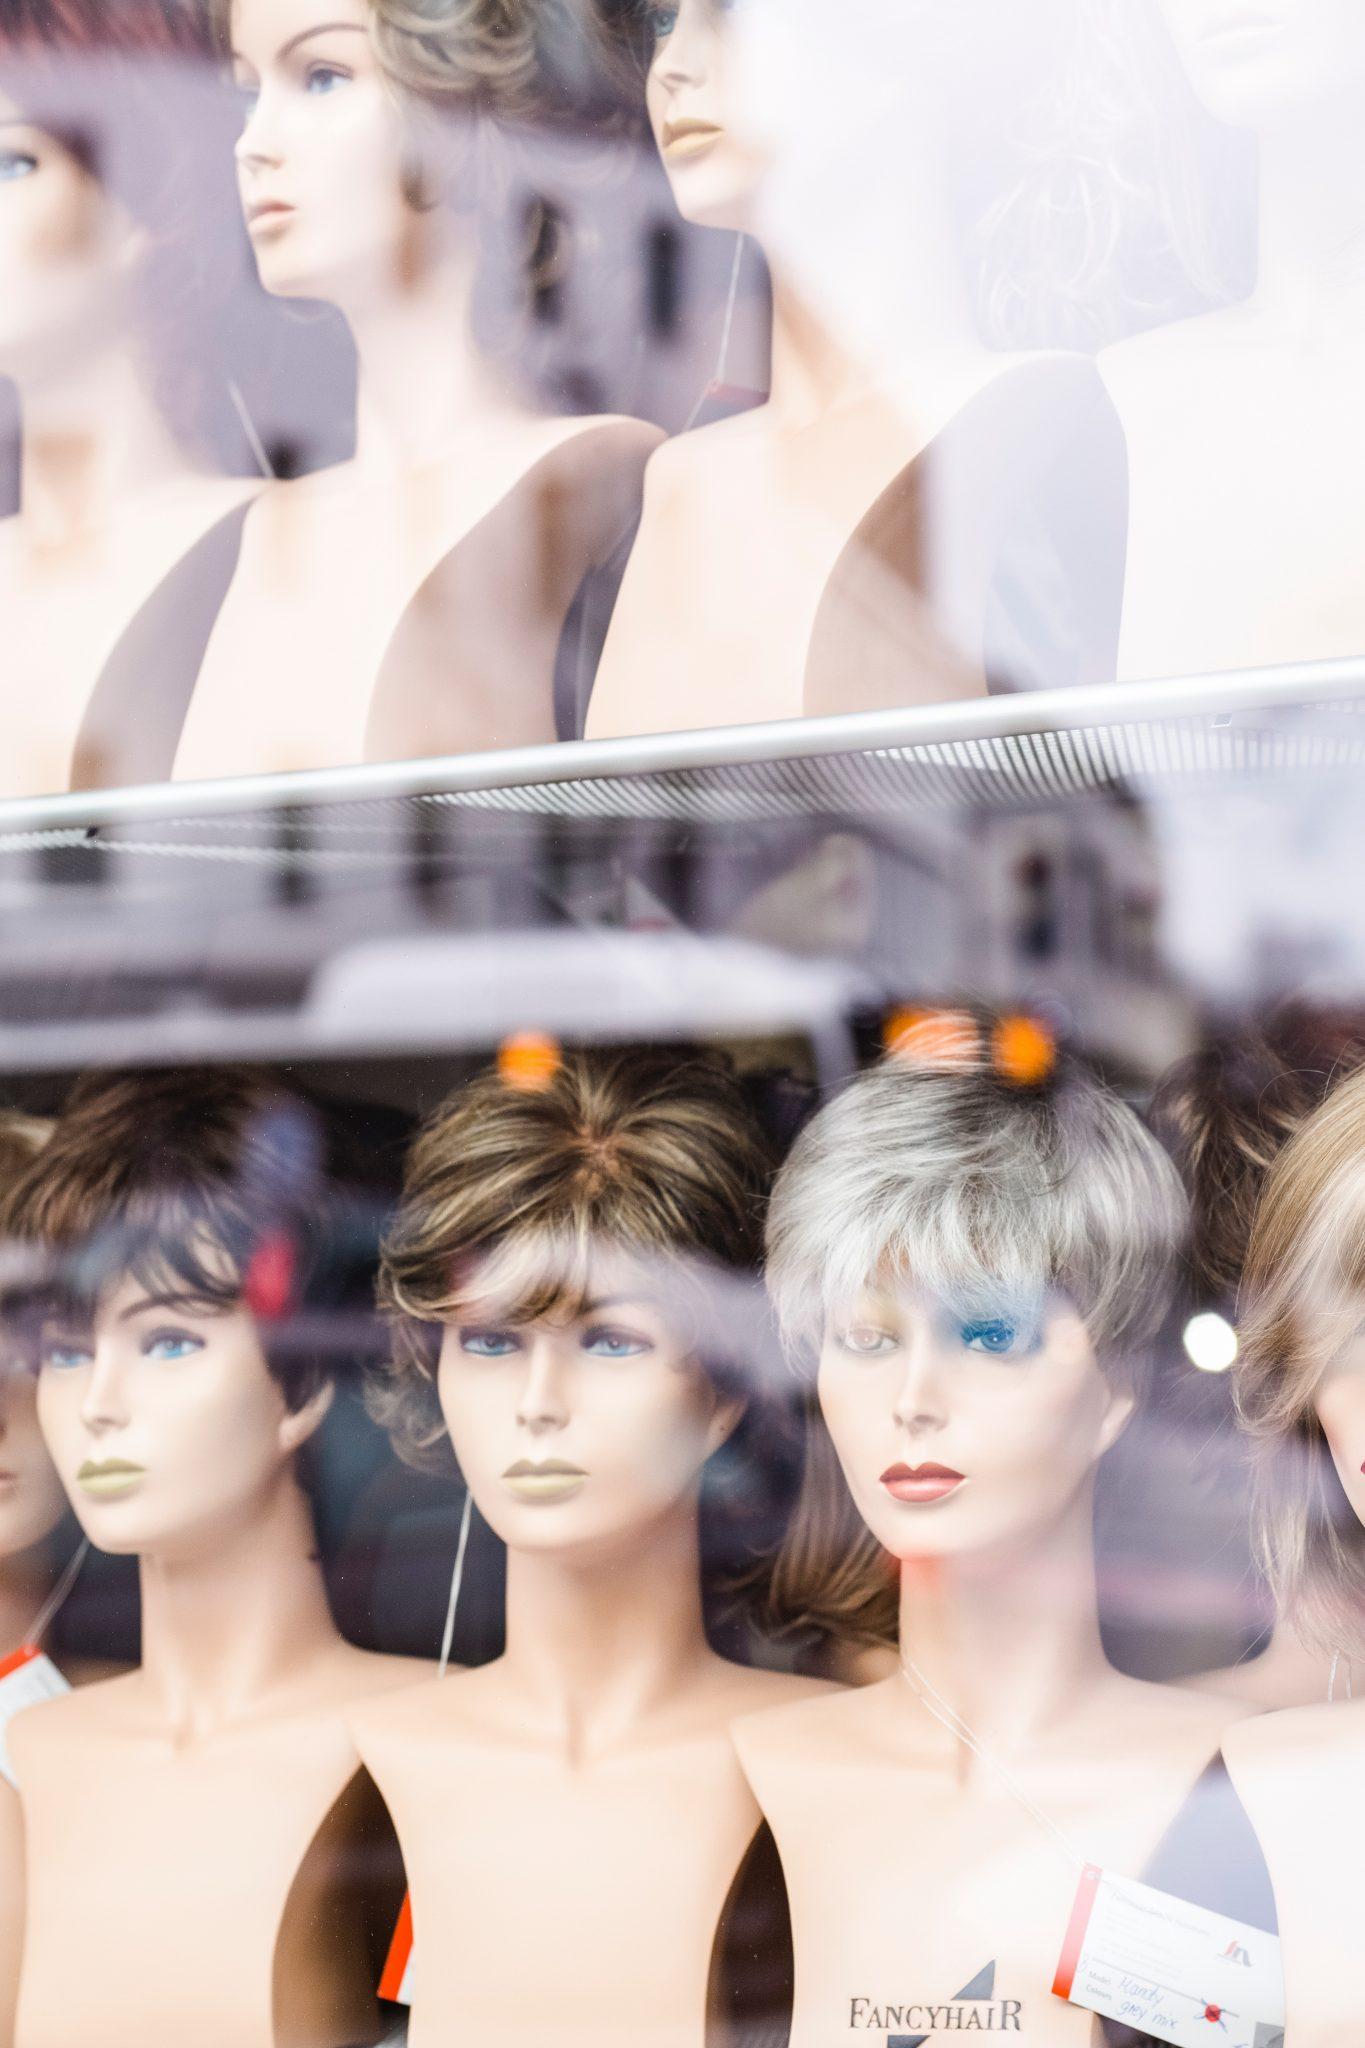 Hairdresser Booking Website